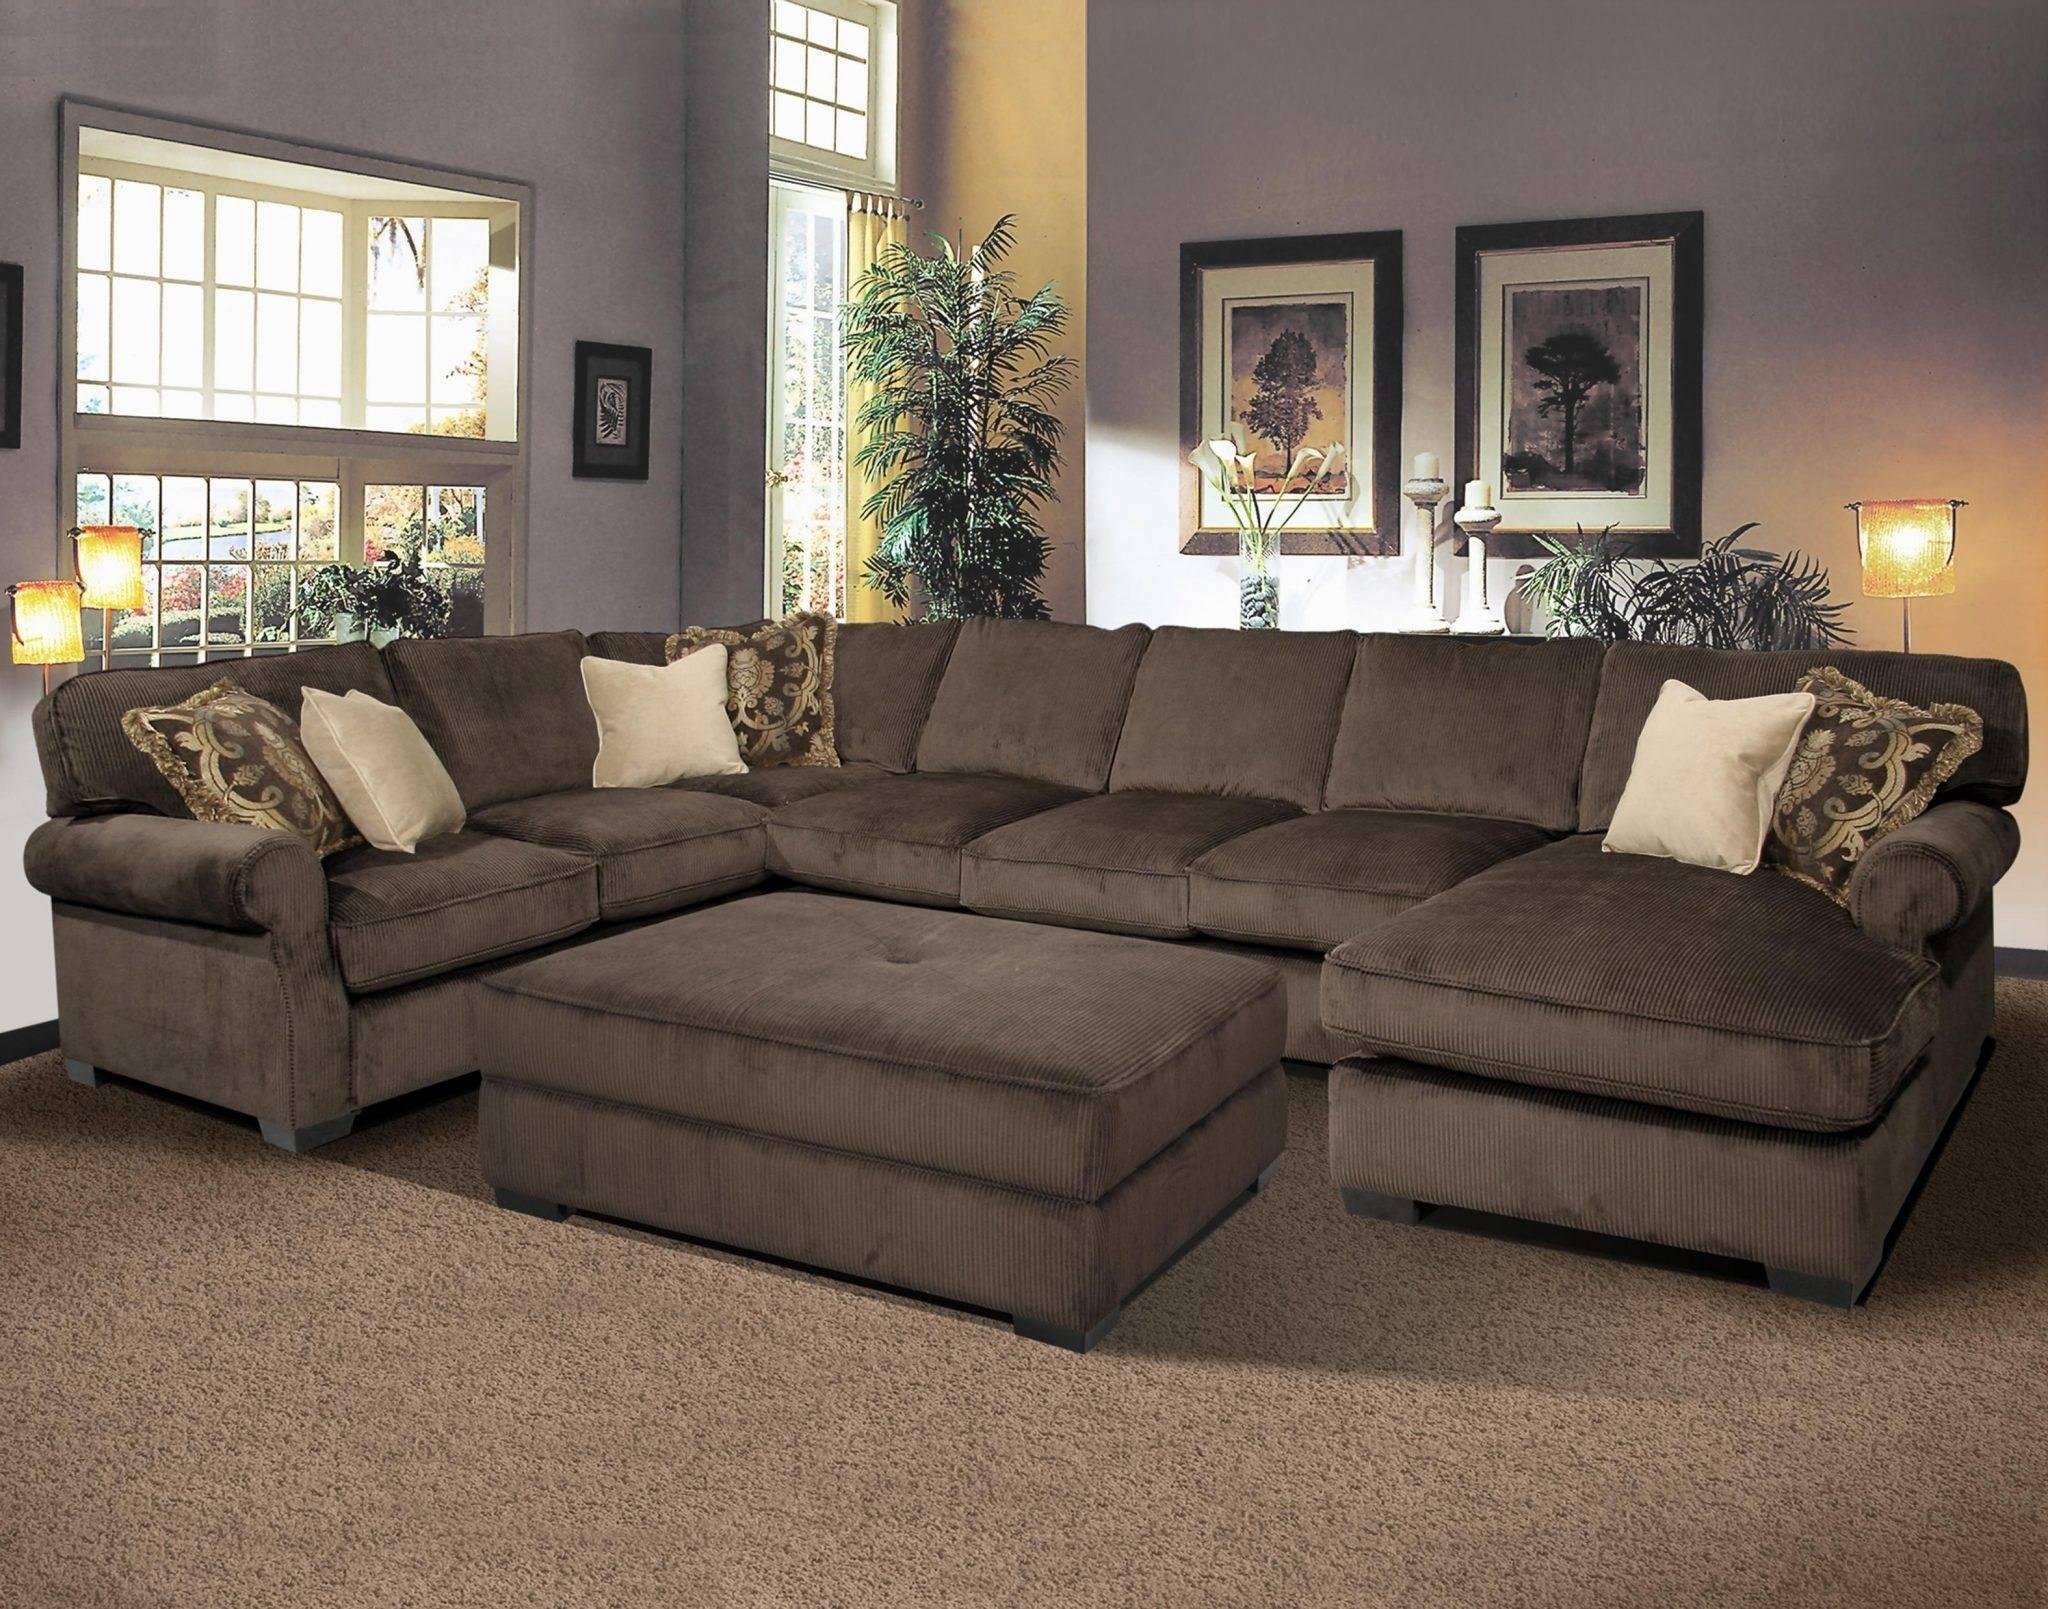 Sofas Center : Chaise Lounge Sleeper Sofa Fascinating Image regarding Long Chaise Sofa (Image 18 of 25)